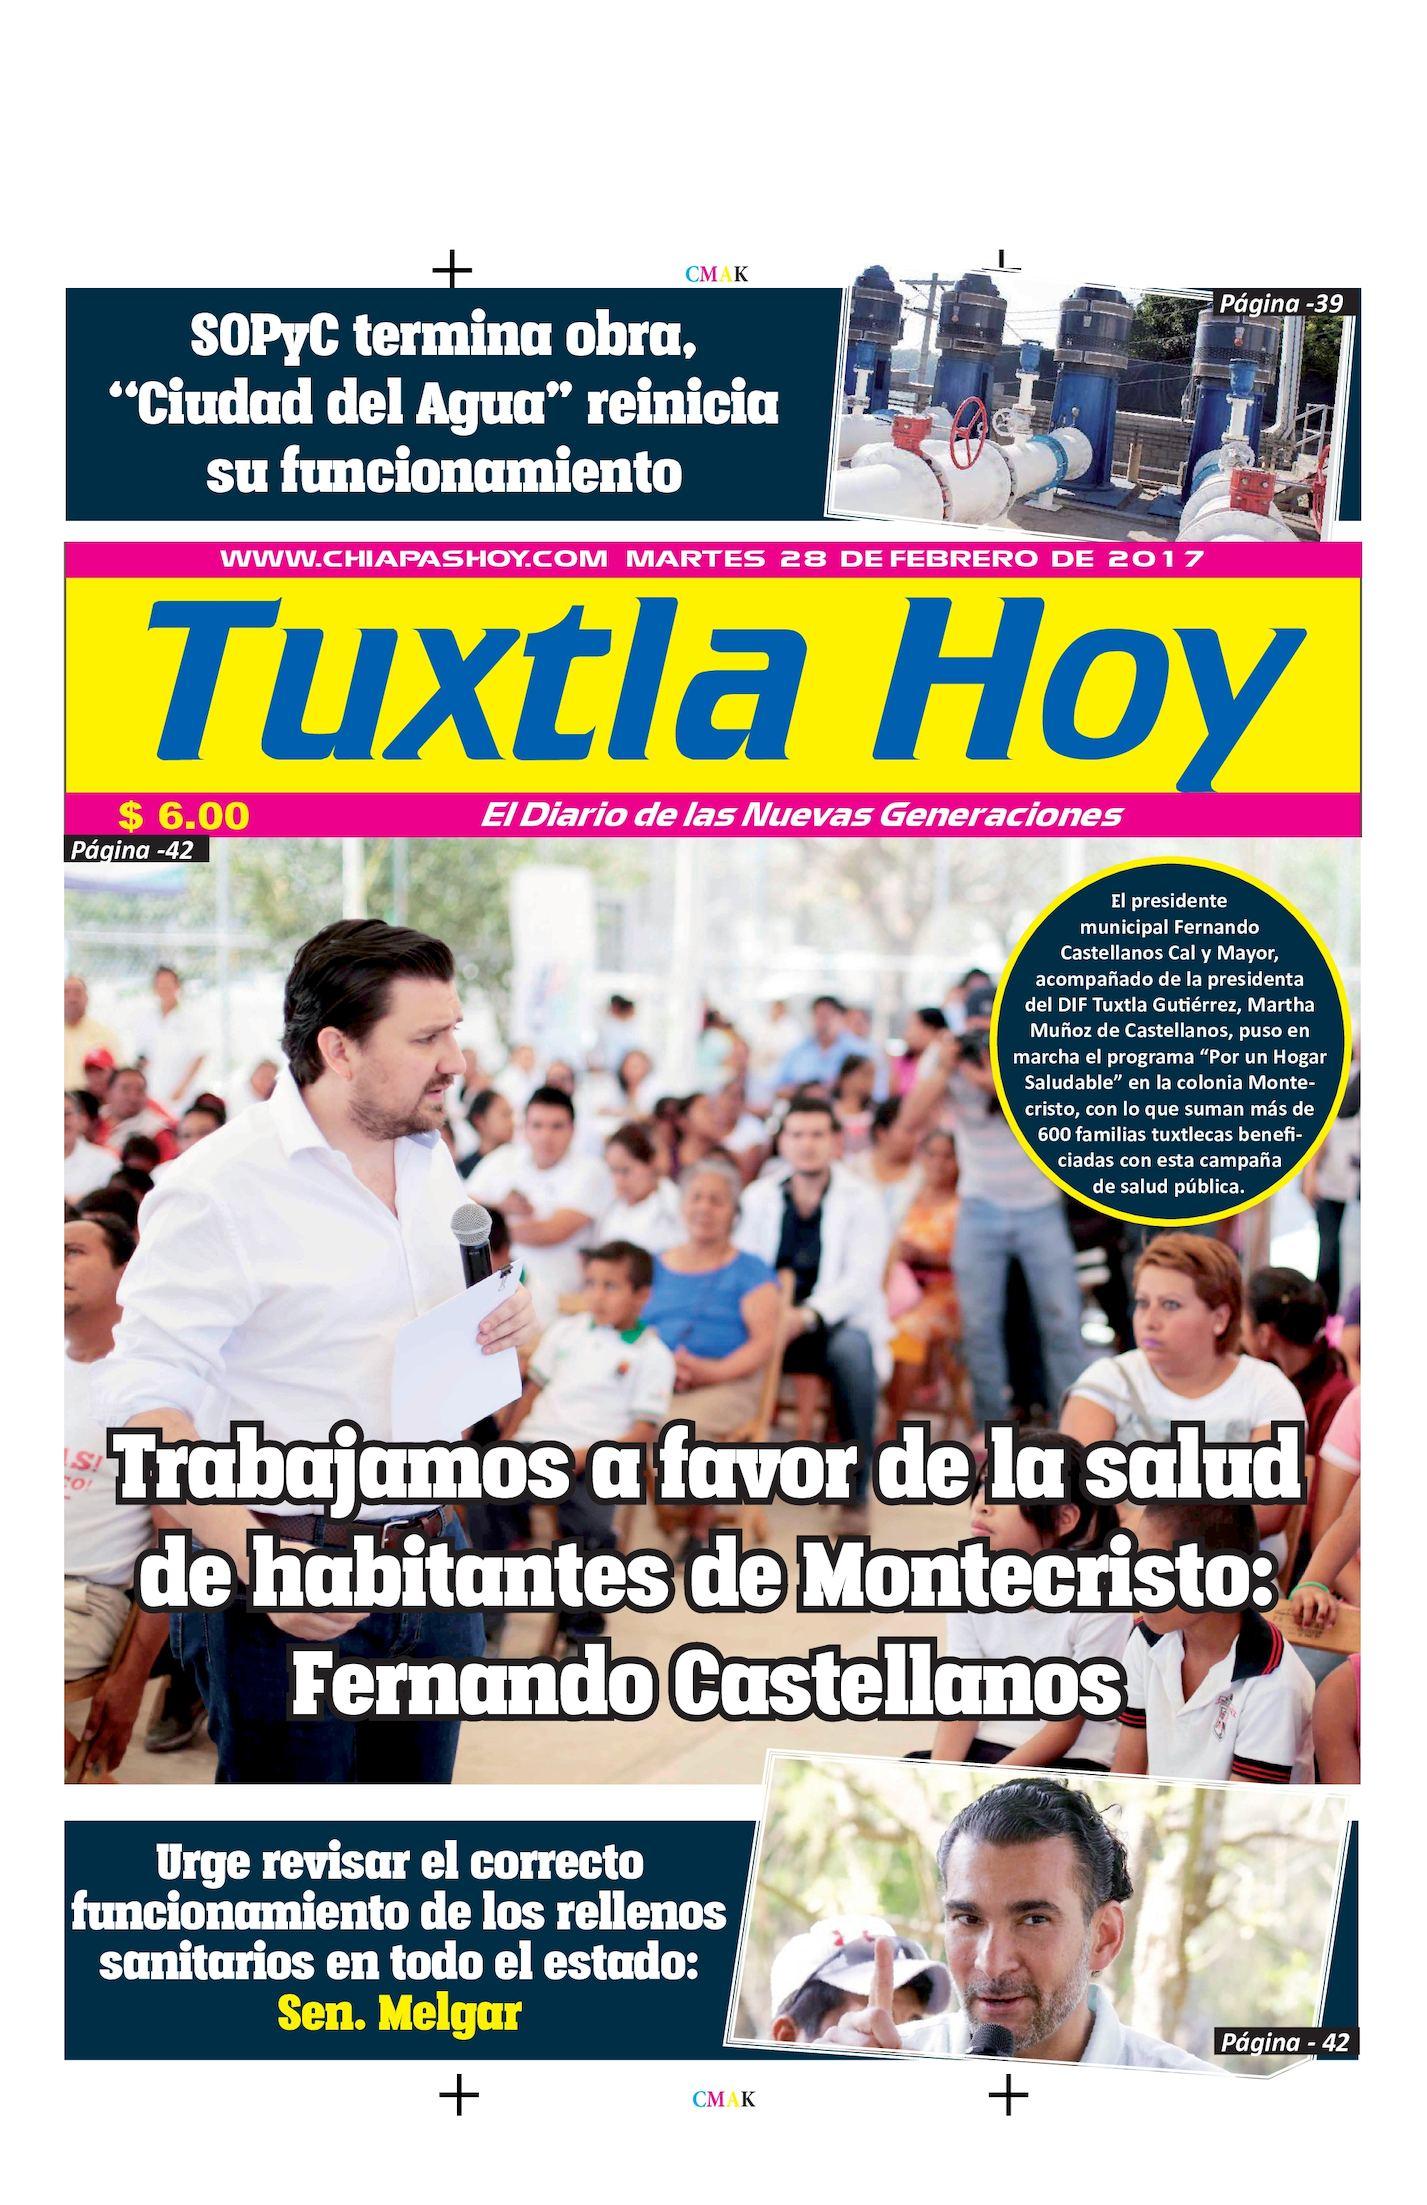 TUXTLA HOY 28 DE FEBRERO